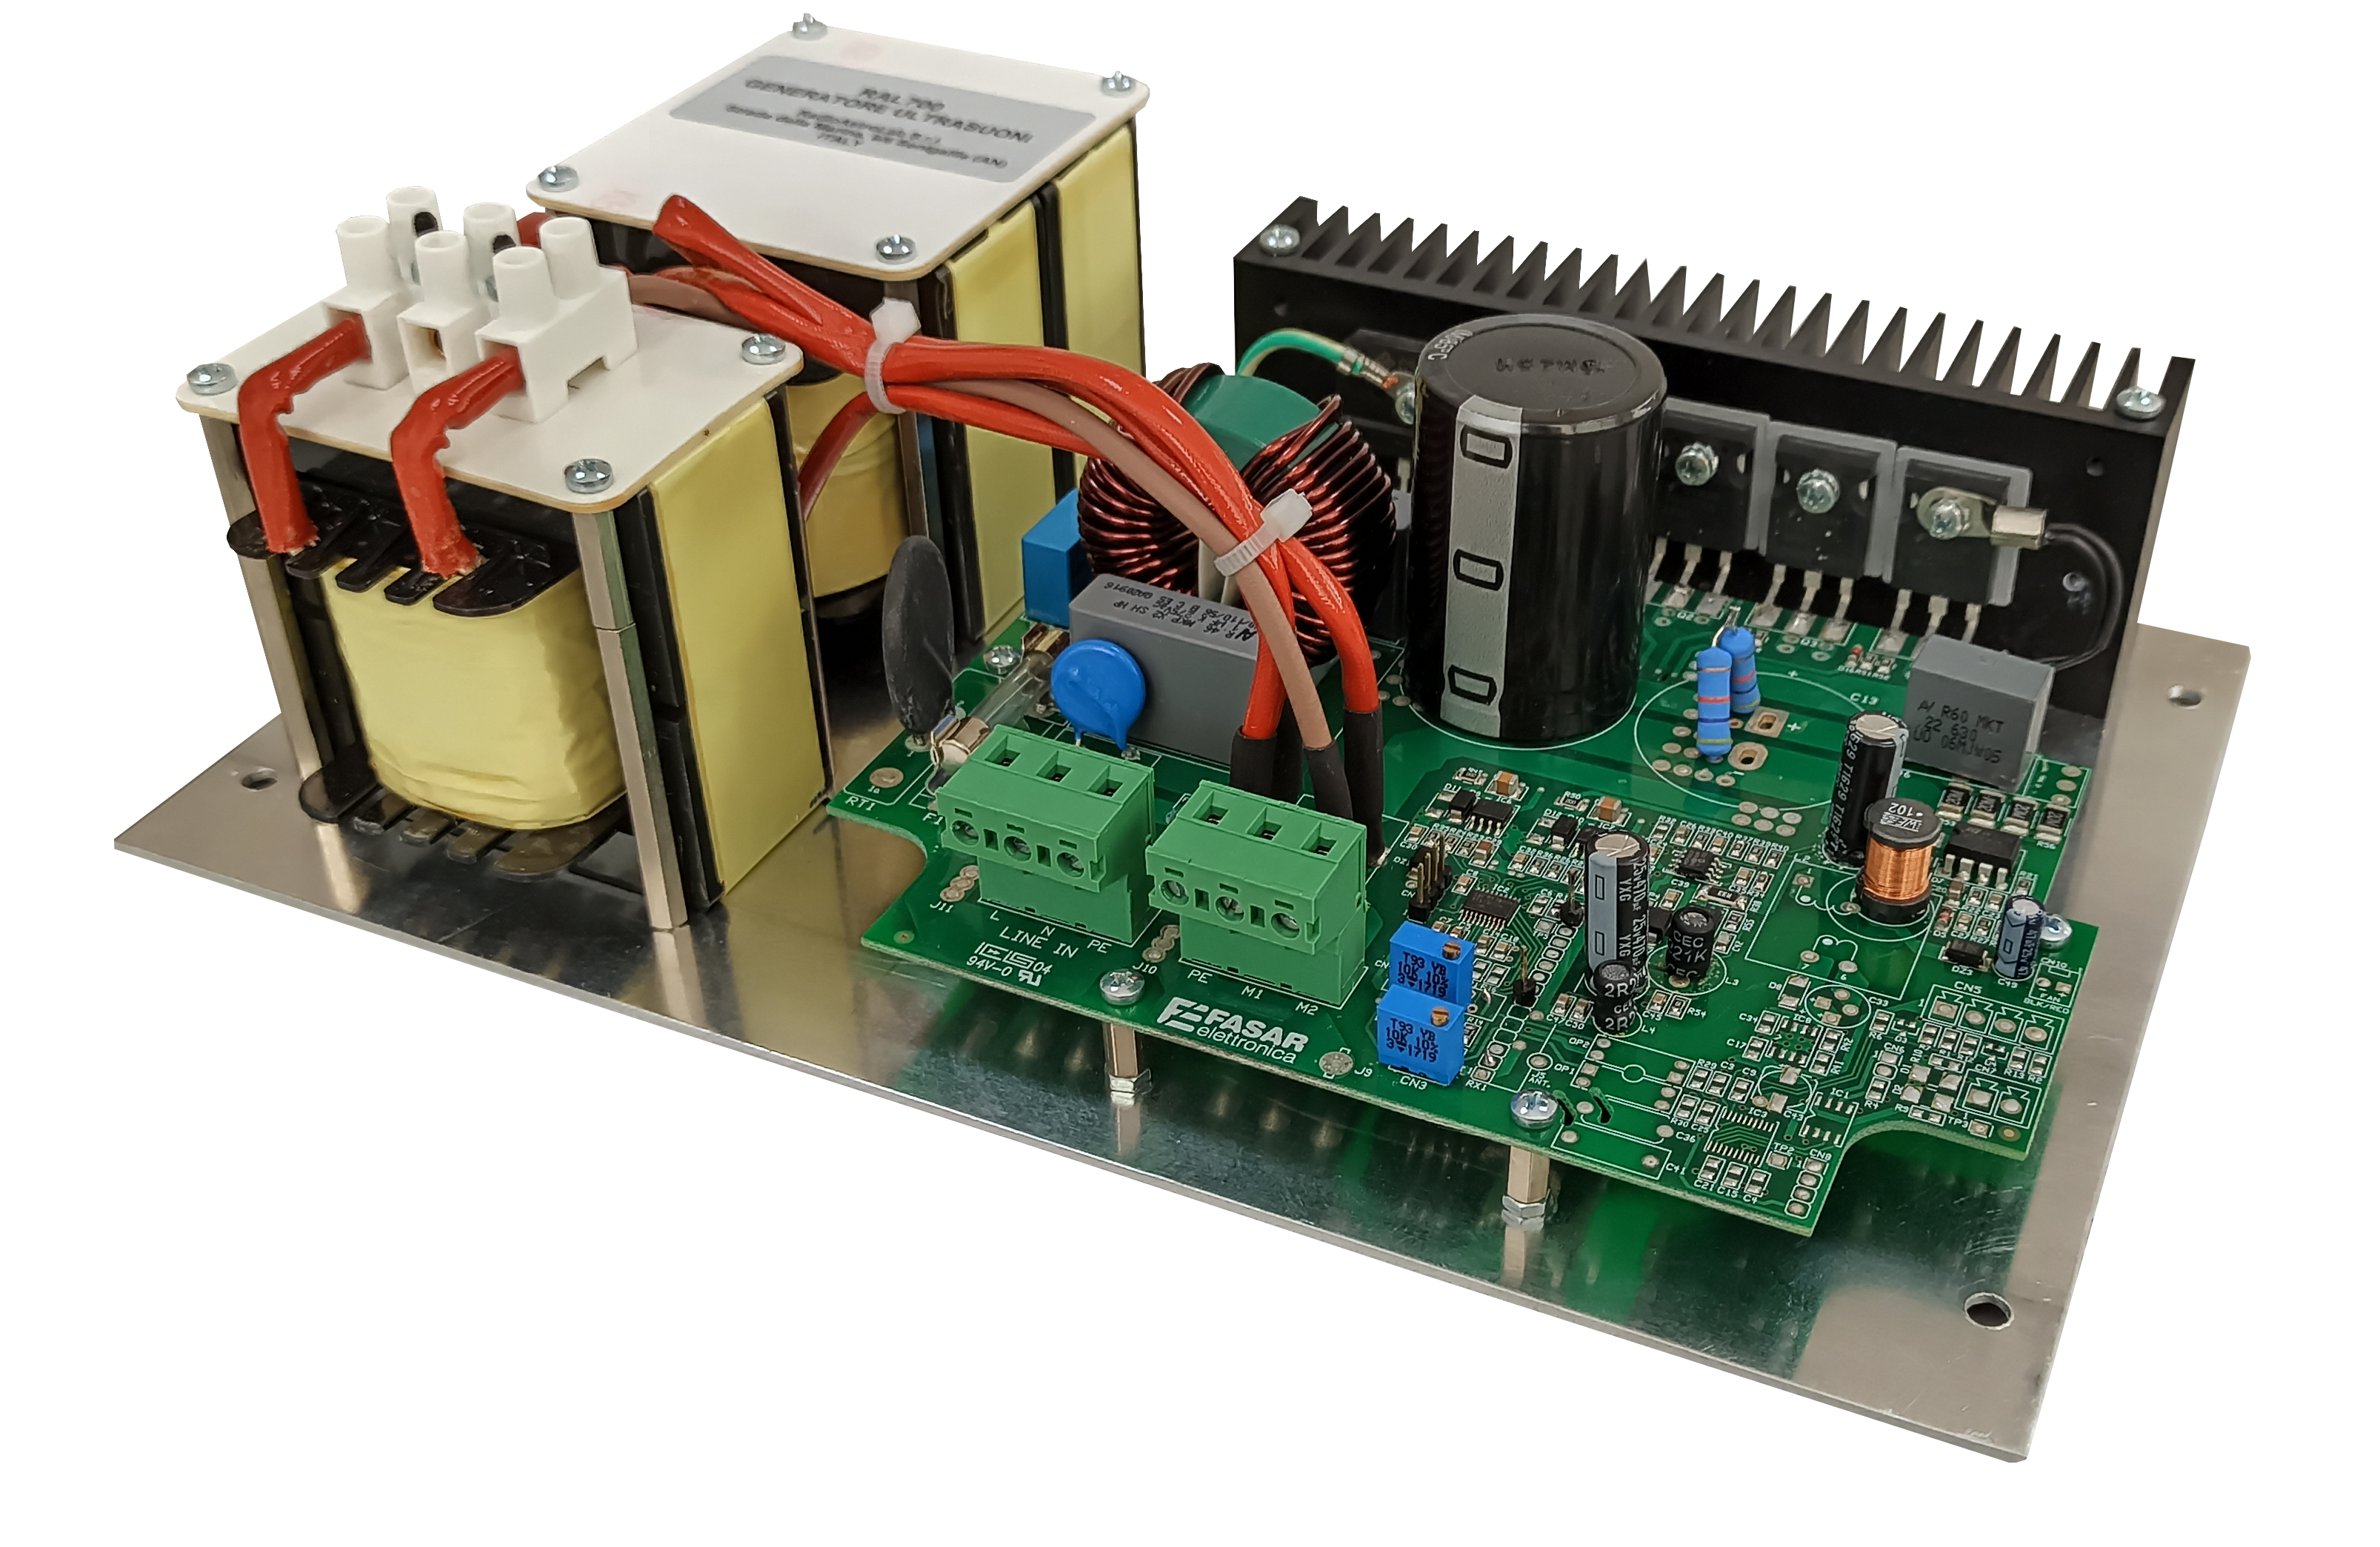 radioastrolab RAL700 generatore ultrasuoni